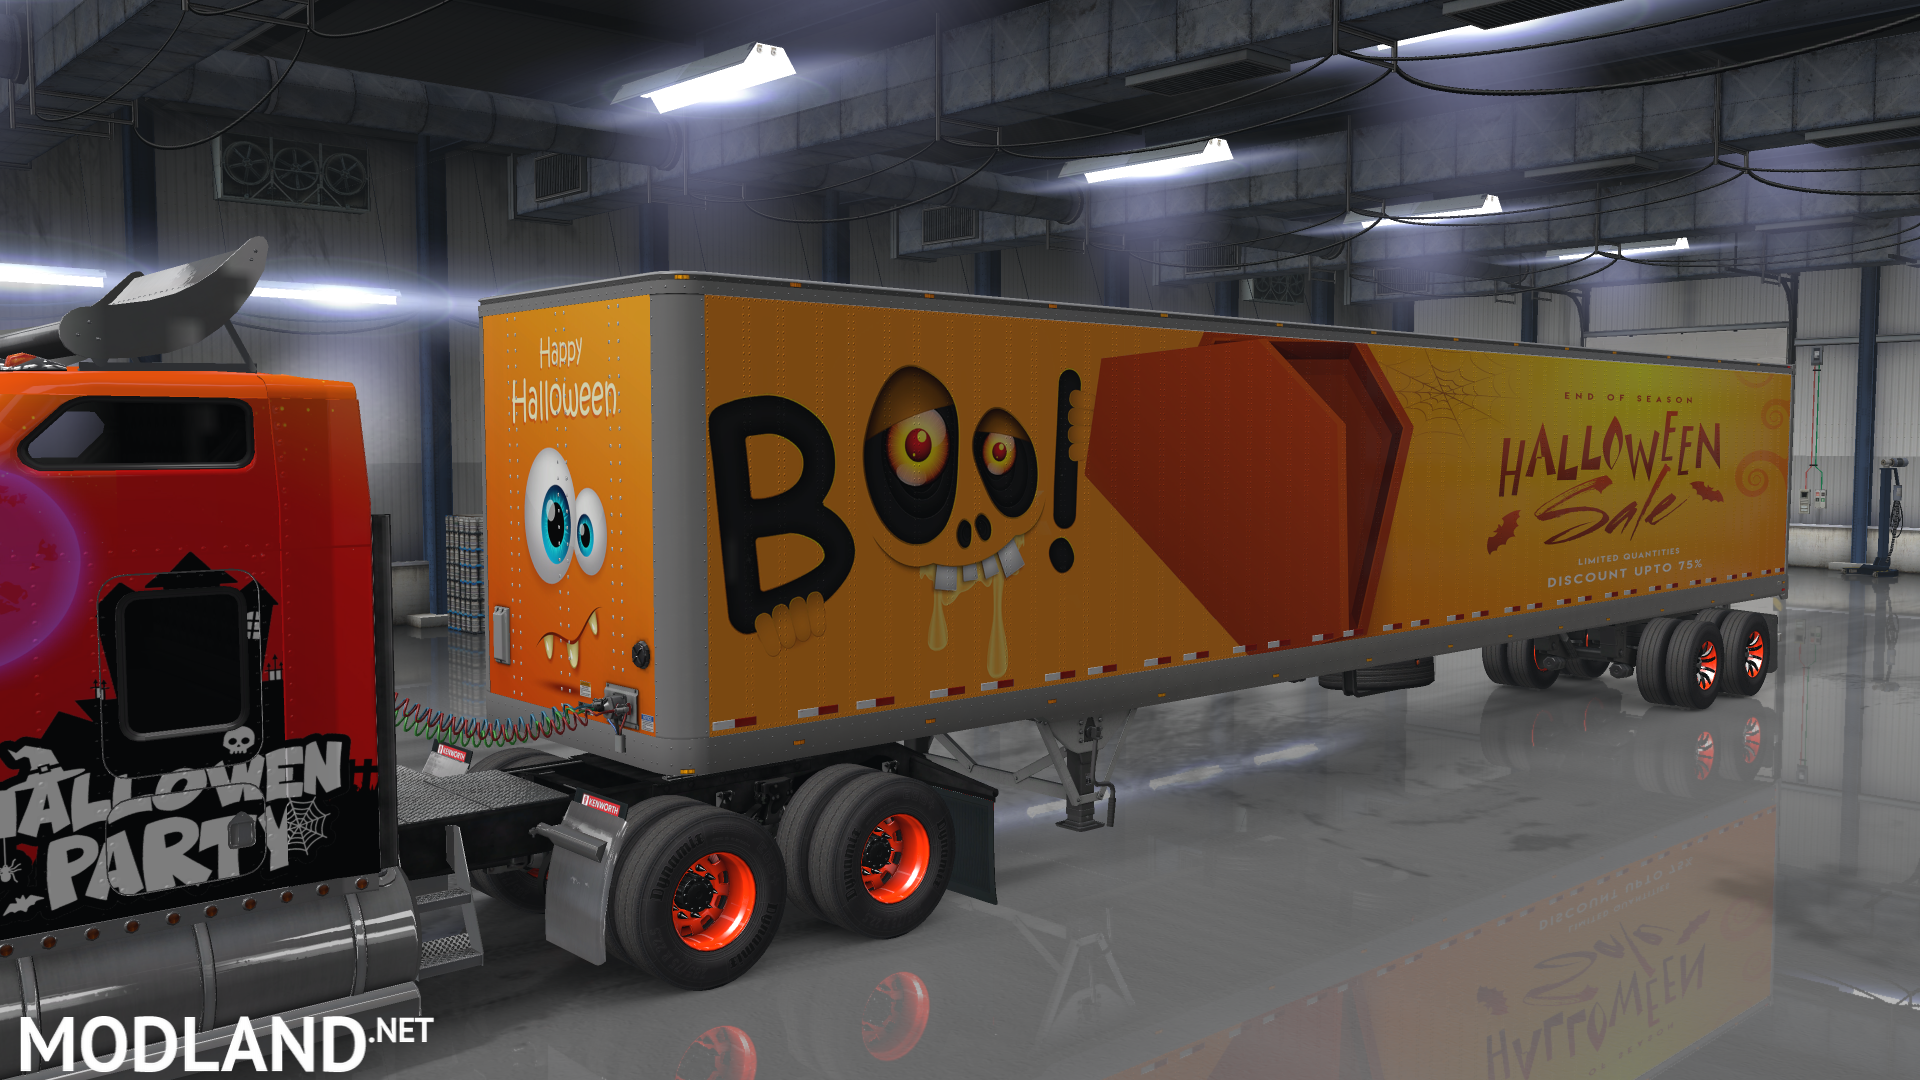 w900 halloween skin + 7 trailer skins mod for american truck